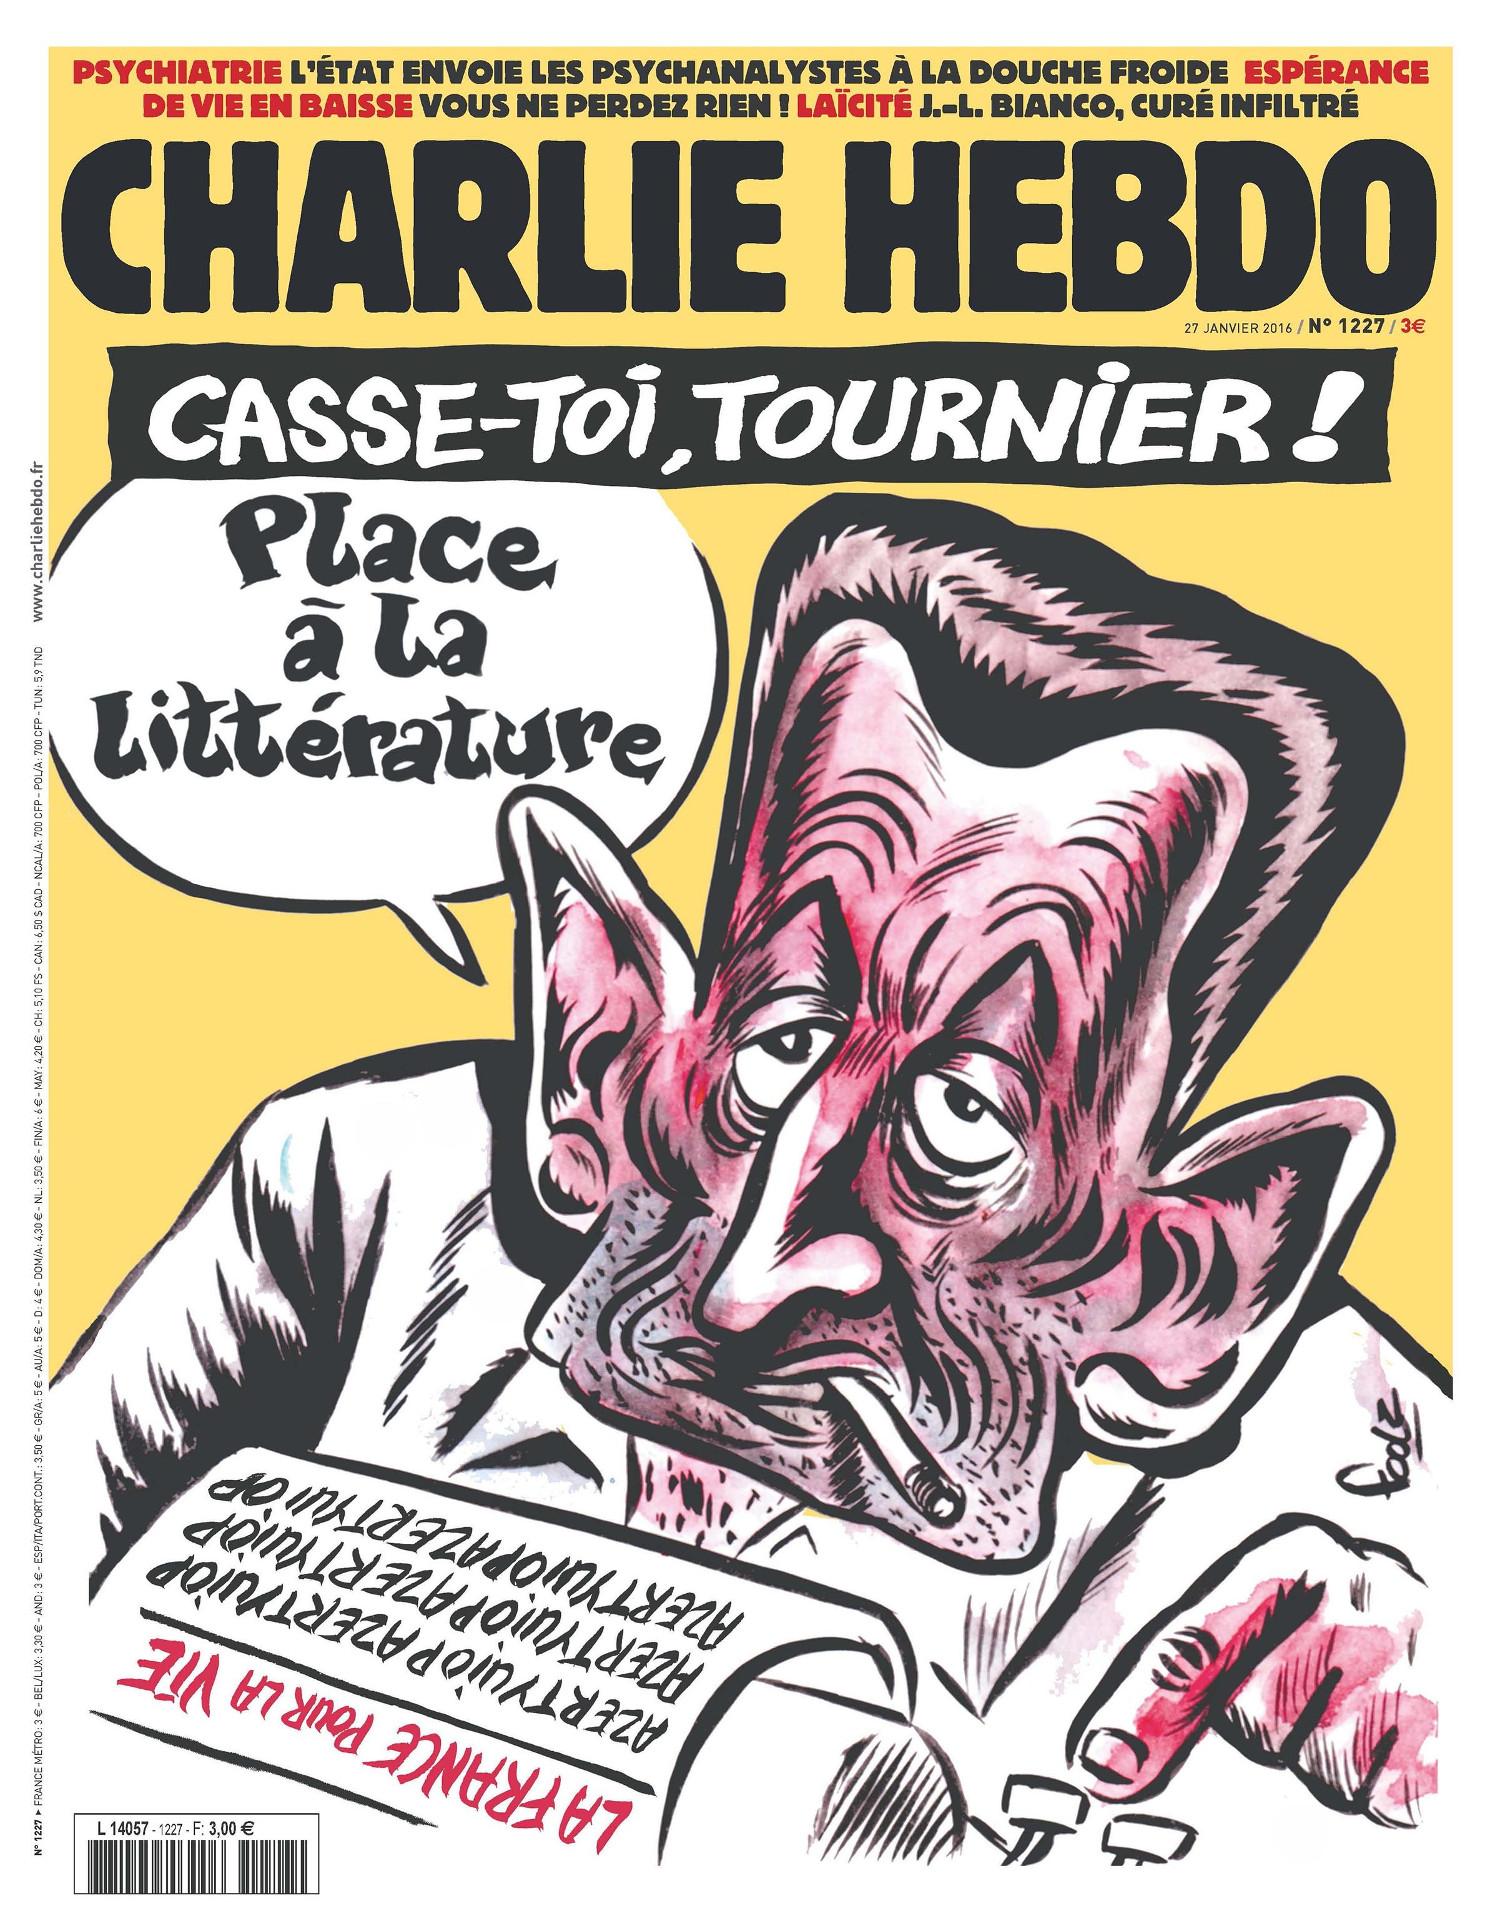 Charlie Hebdo n°1227 --- 27 janvier 2016